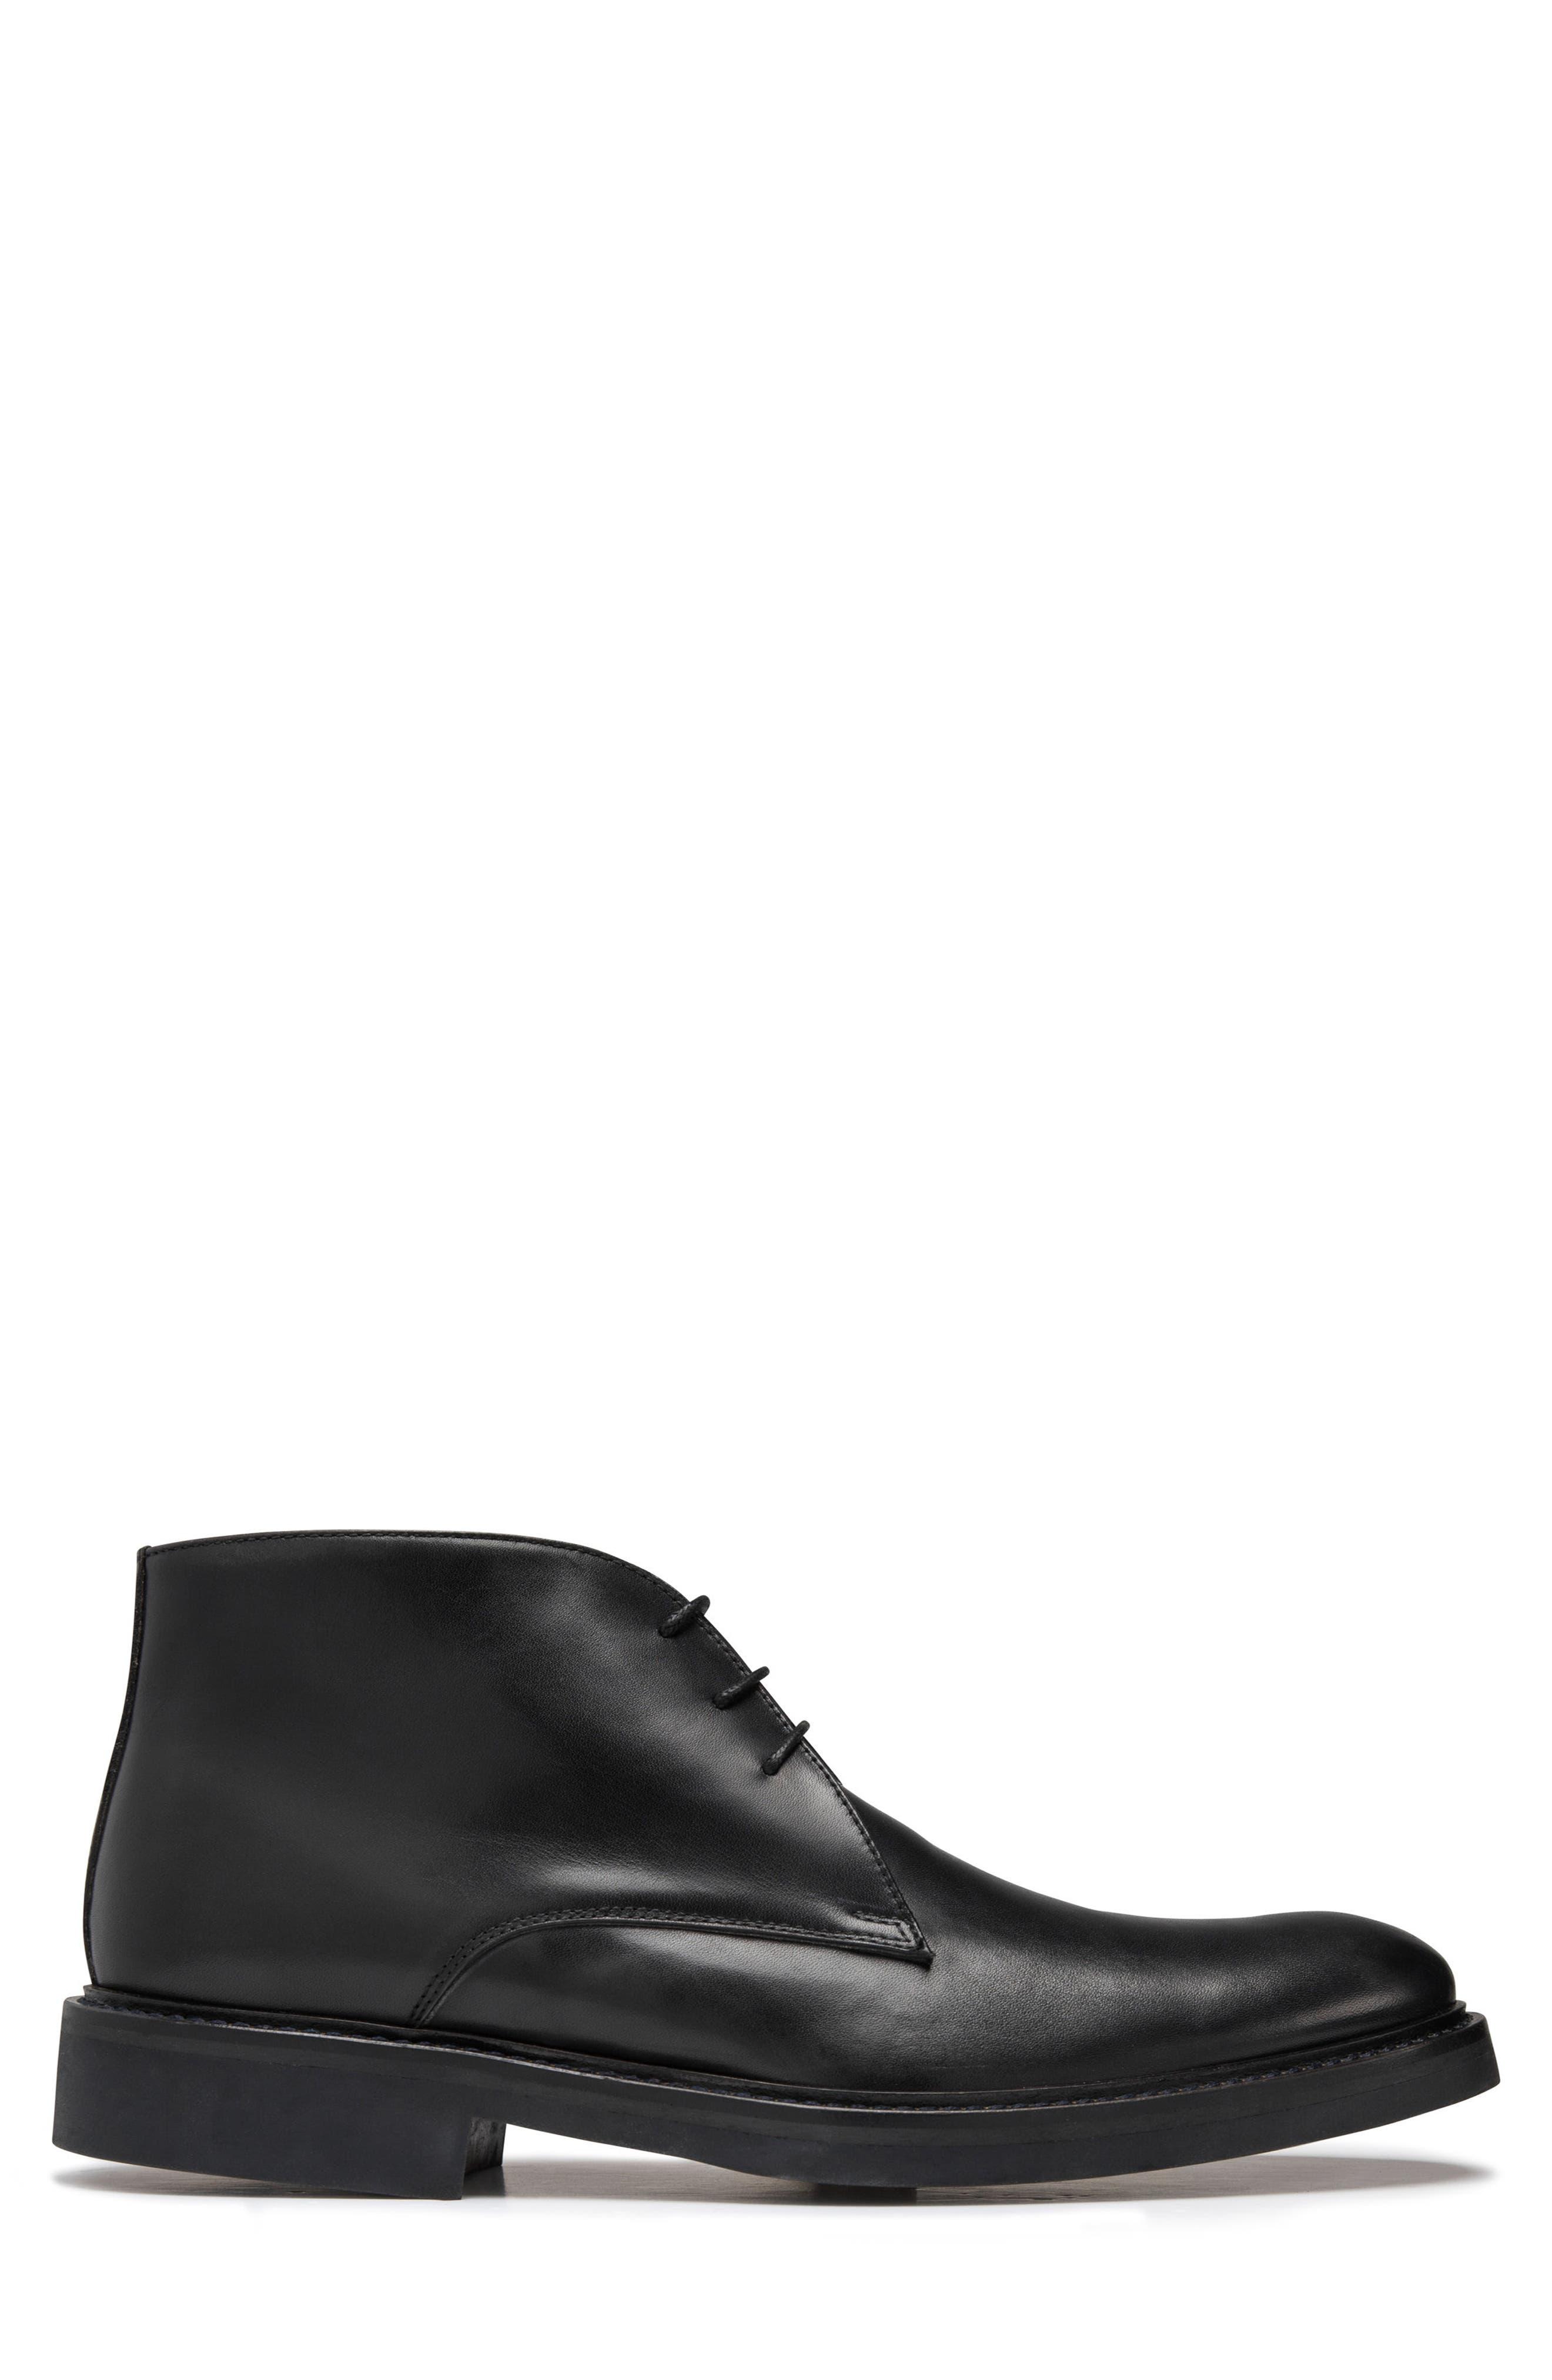 Milano Chukka Boot,                             Alternate thumbnail 3, color,                             NERO